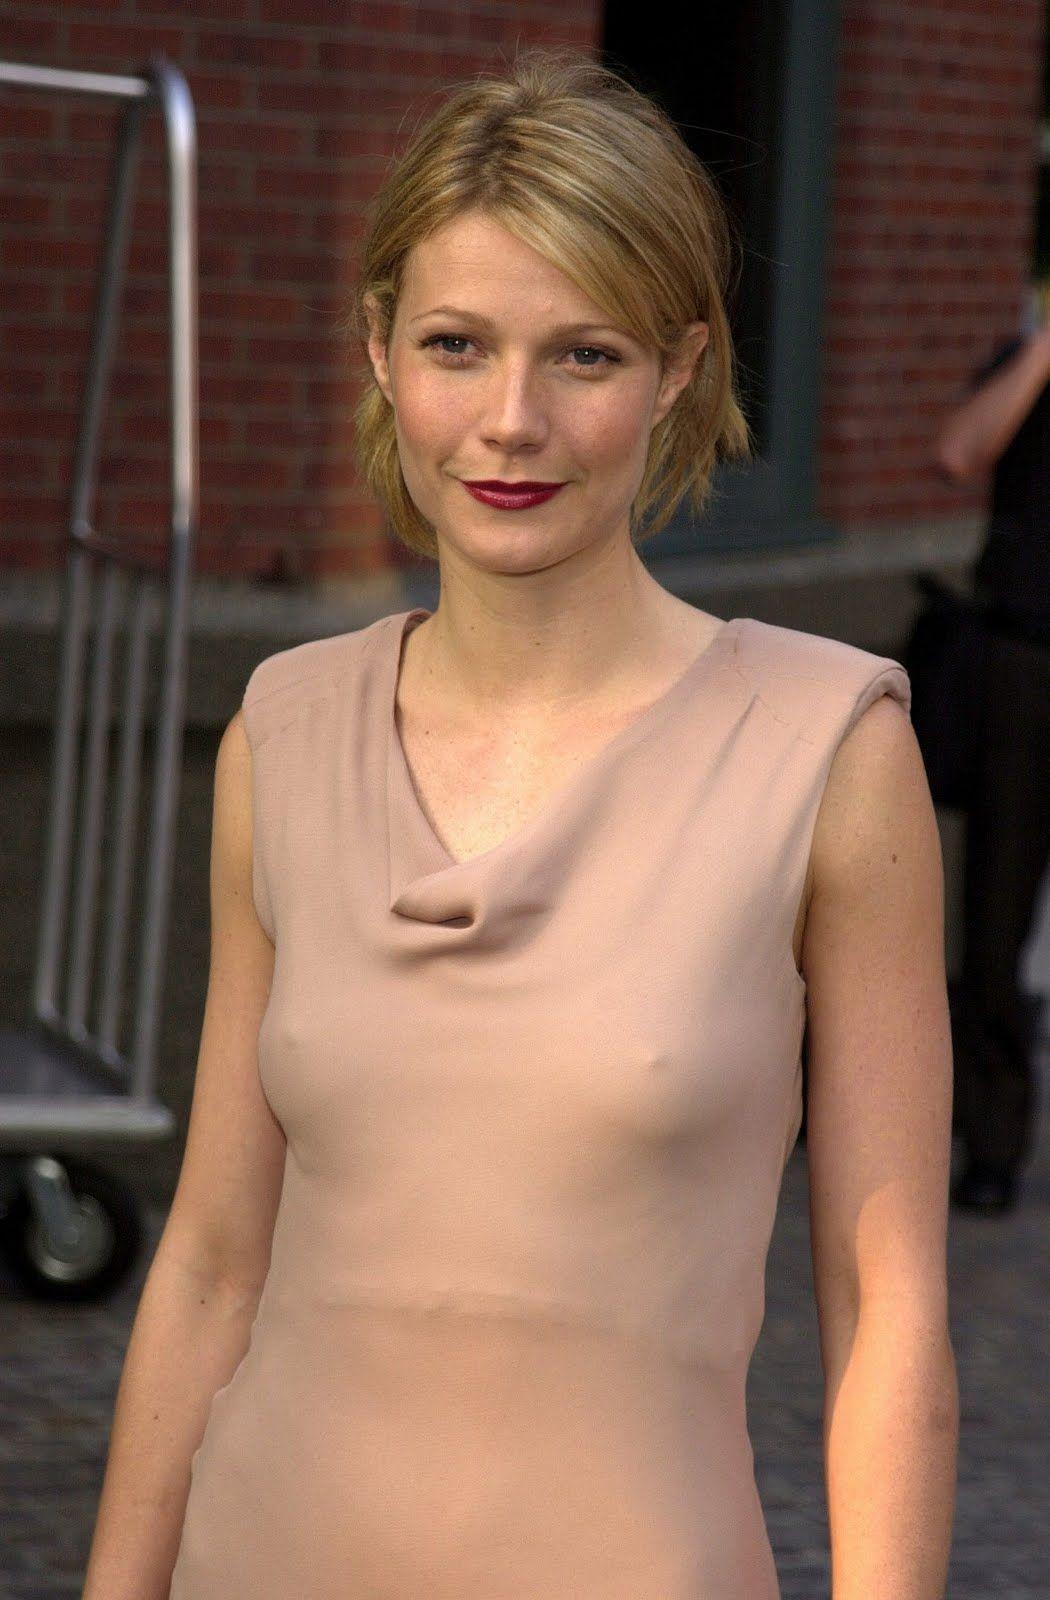 Claire rourke fake nudes